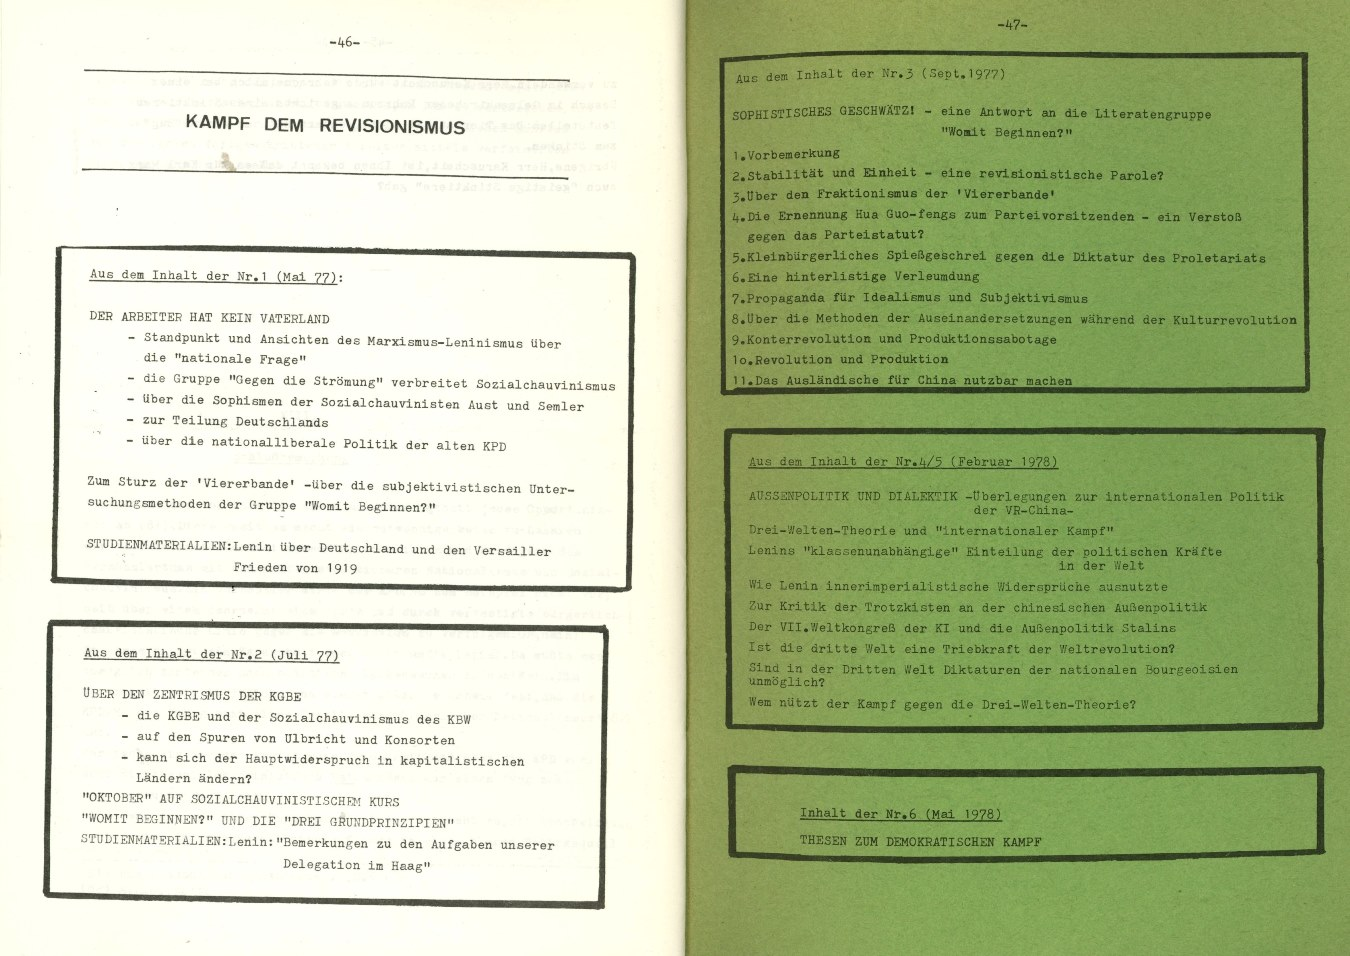 Muenchen_Kampf_dem_Revisionismus_1979_09_24